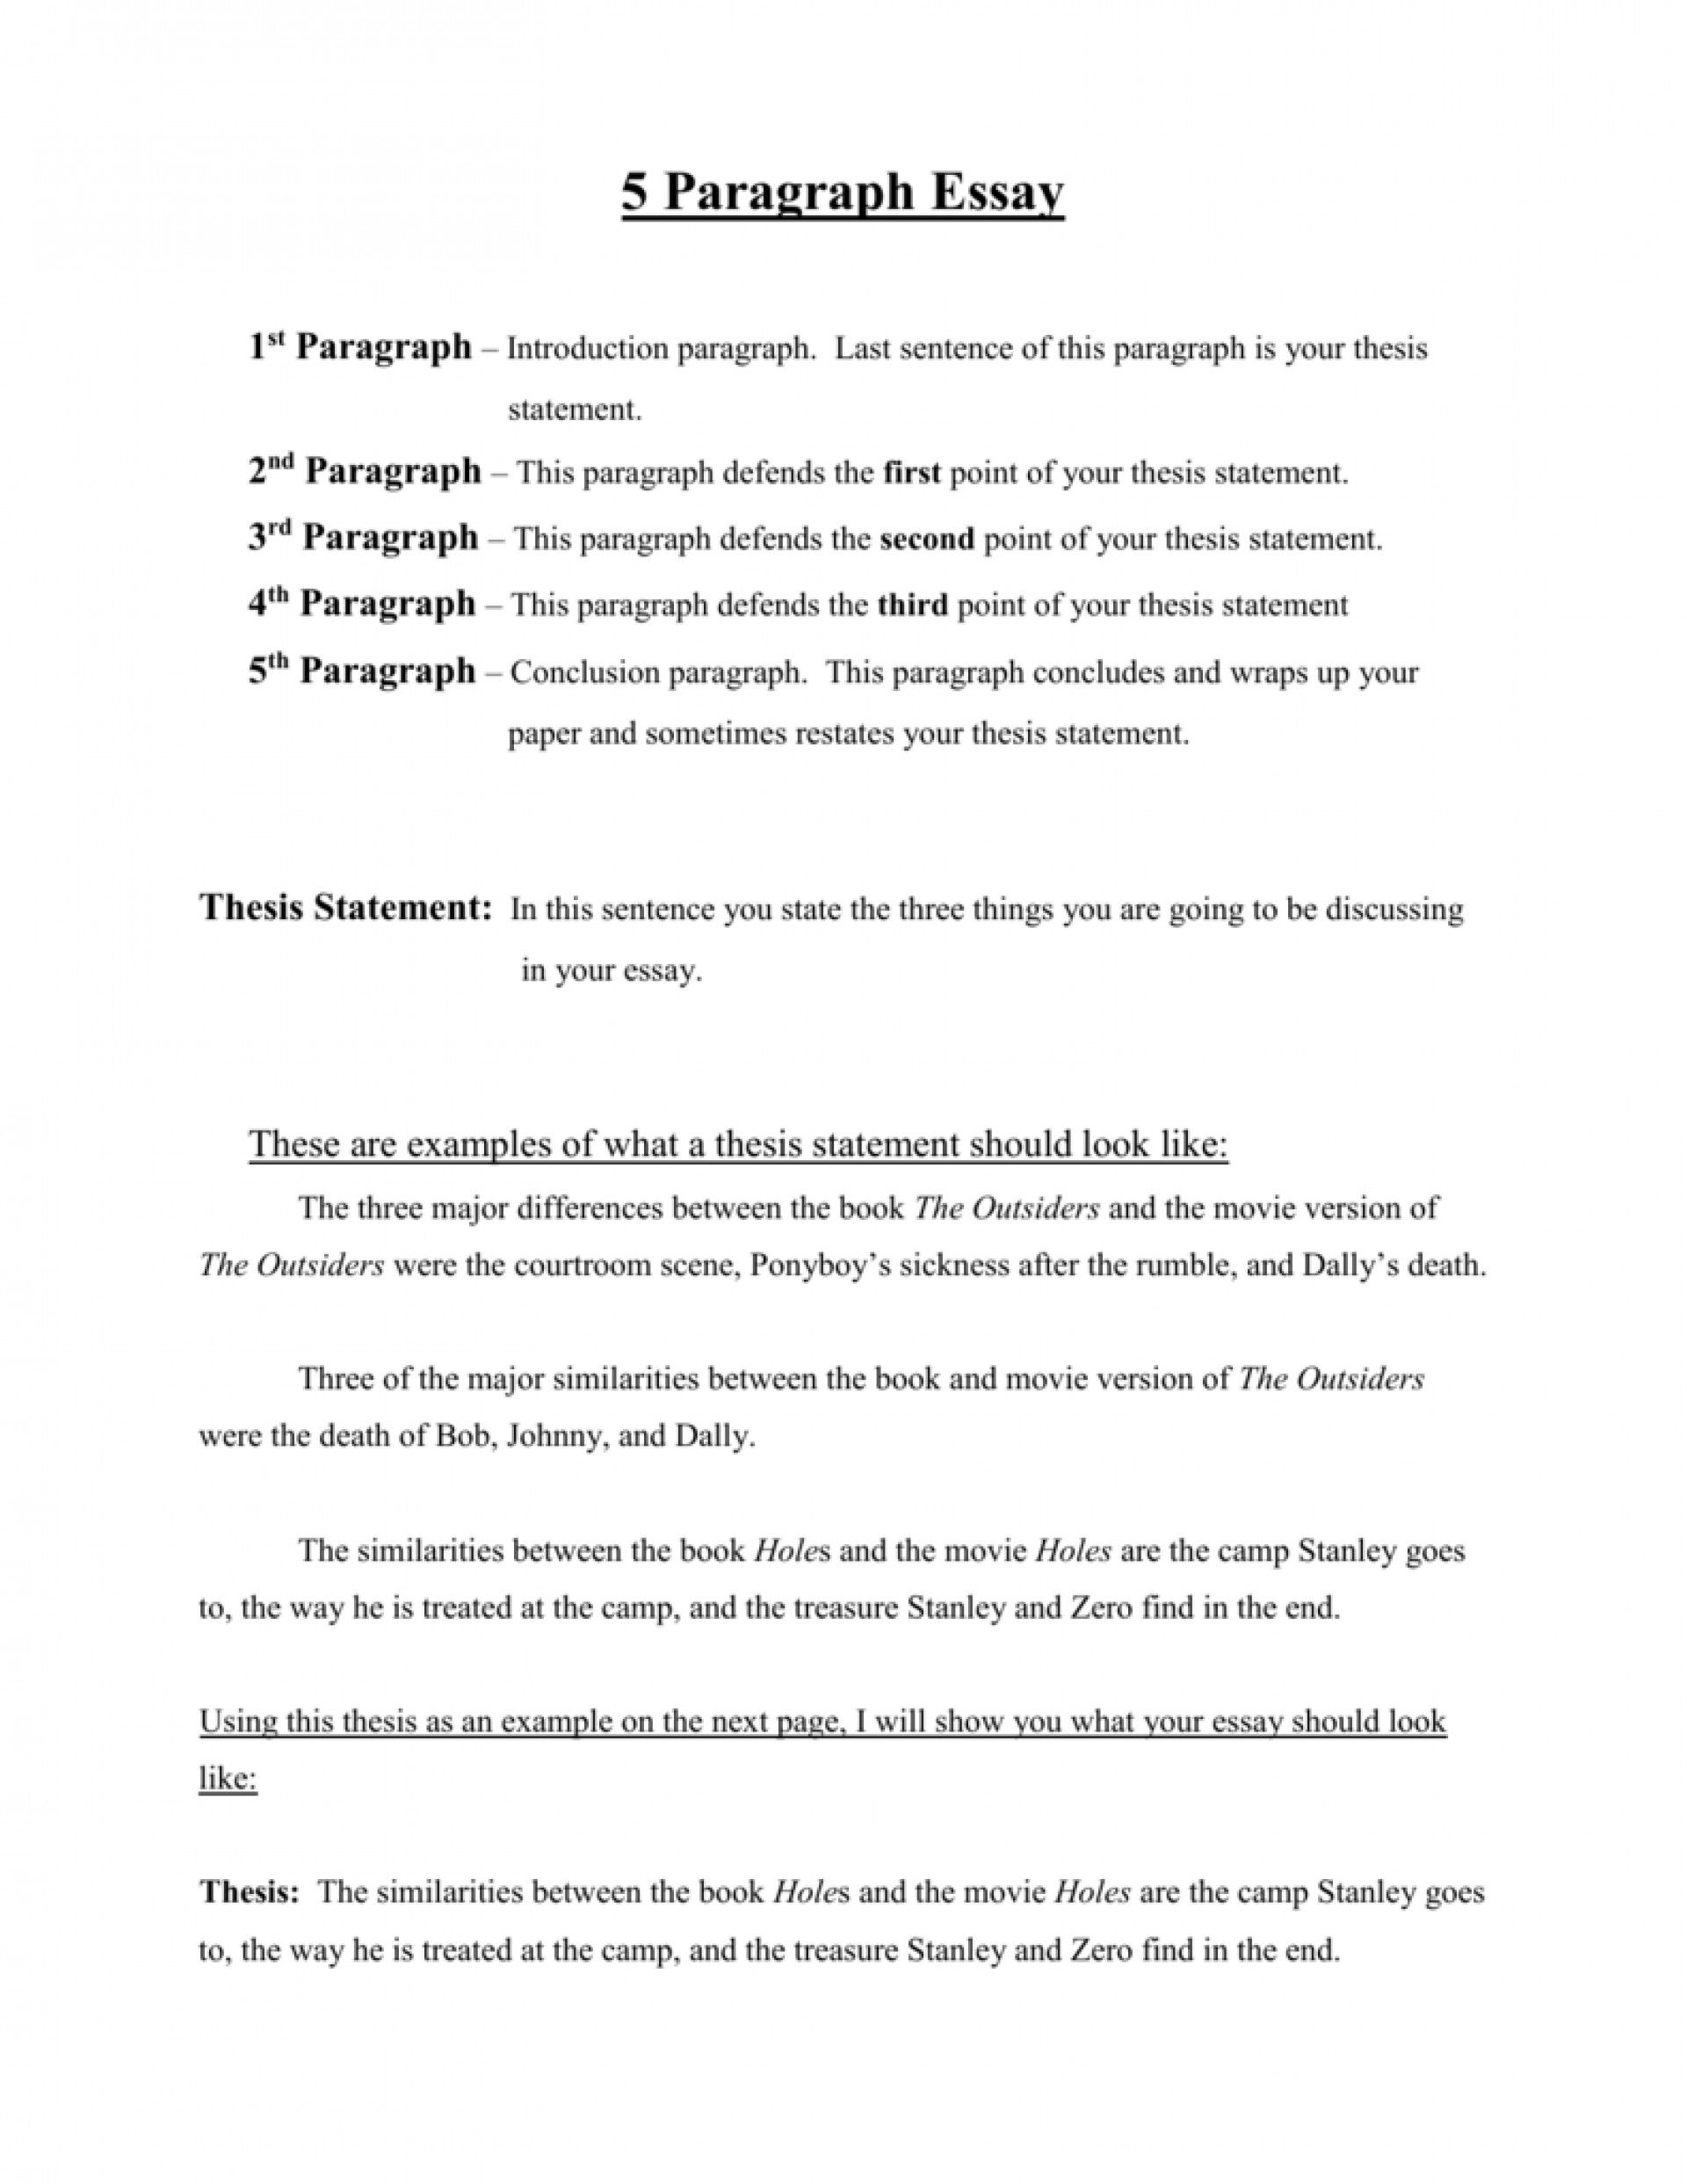 001 Holes Essay Conclusion Example 007877354 2 Breathtaking Black 1920